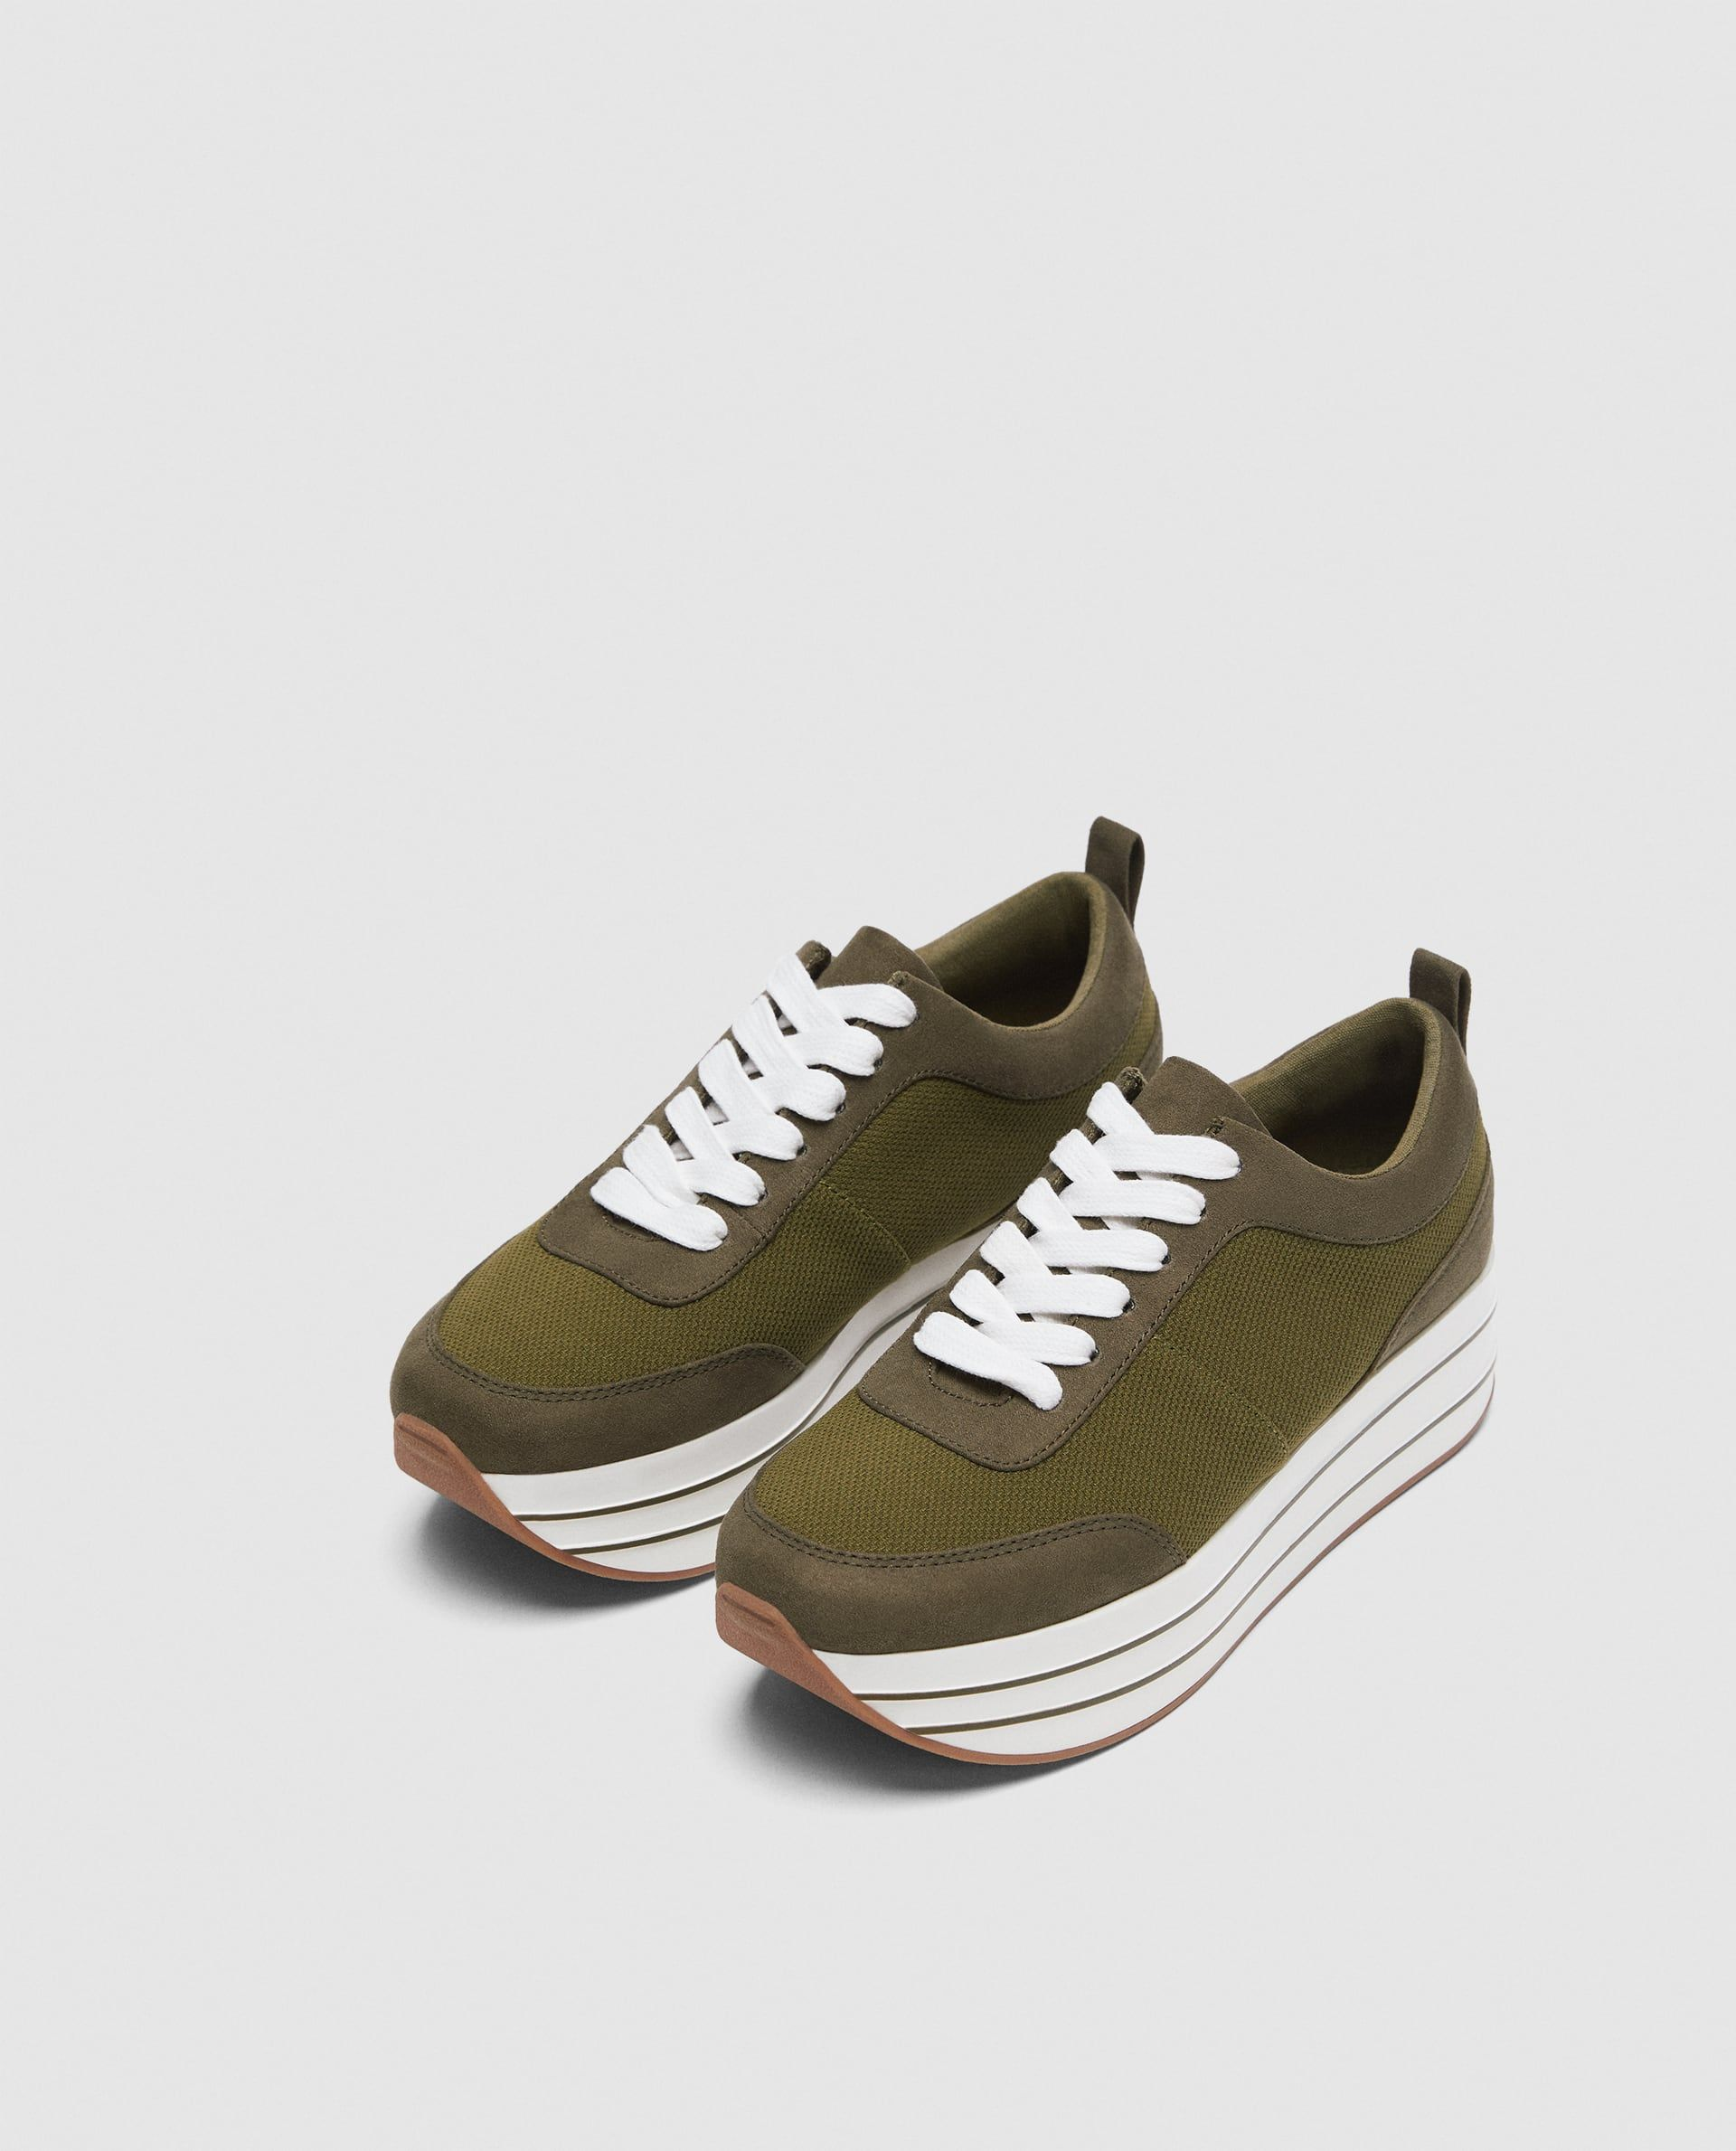 Image 4 Of Platform Sneakers From Zara Platform Sneakers Sneakers Platform Sneakers Outfit